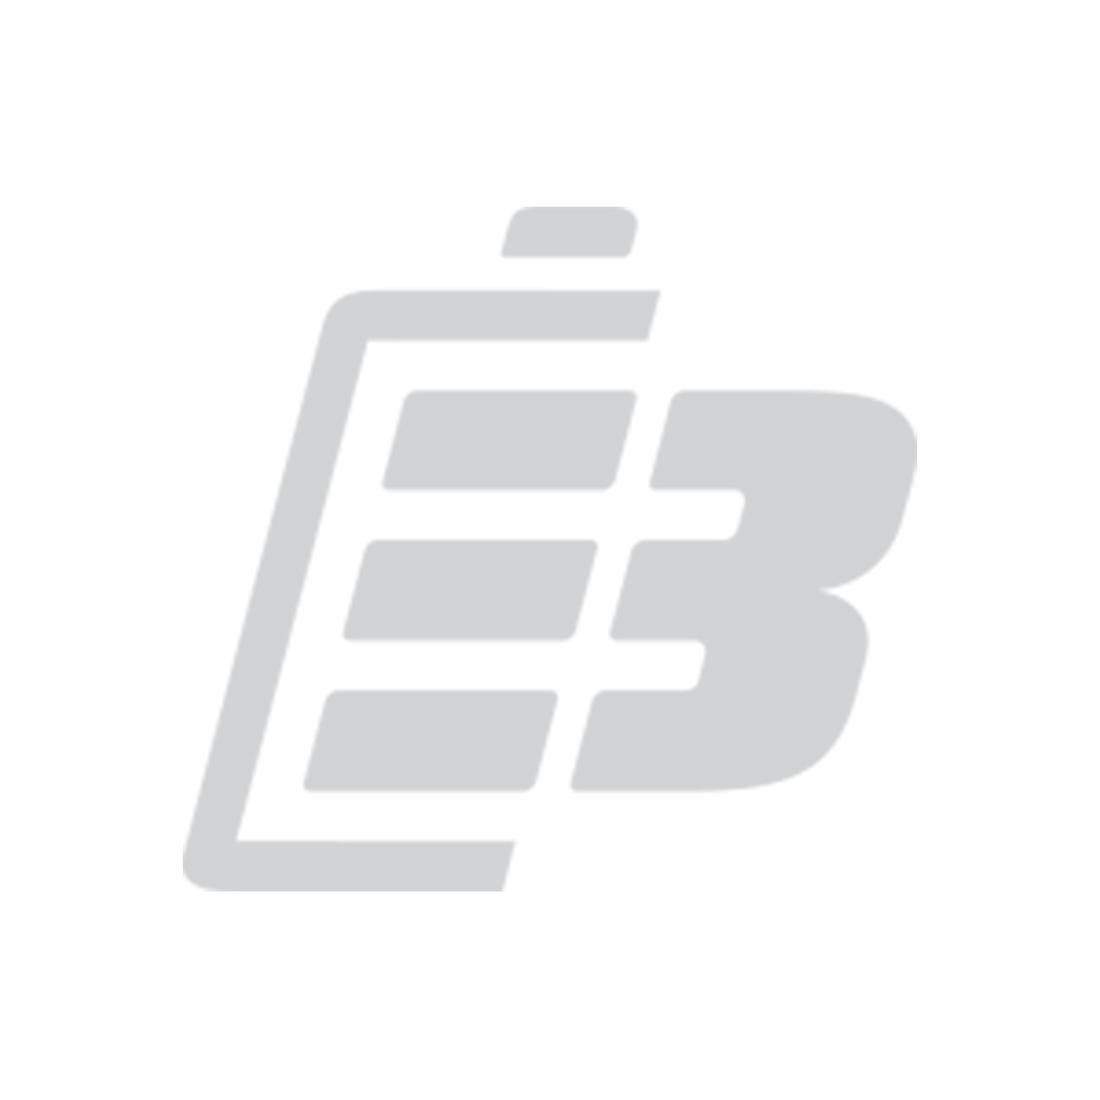 Duracell Ultra M3 CR2 Lithium Battery - Duracell - Brand